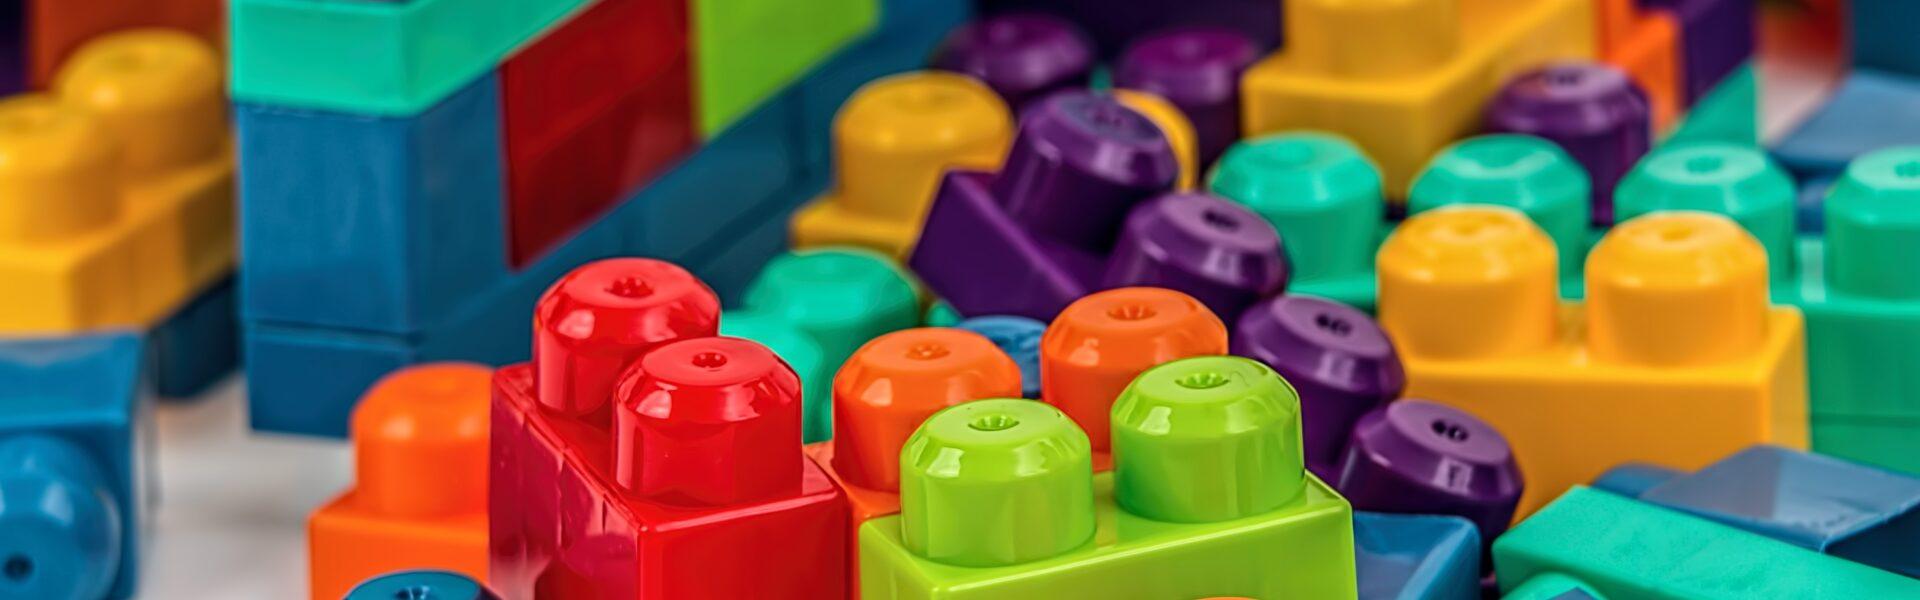 building, blocks, lego